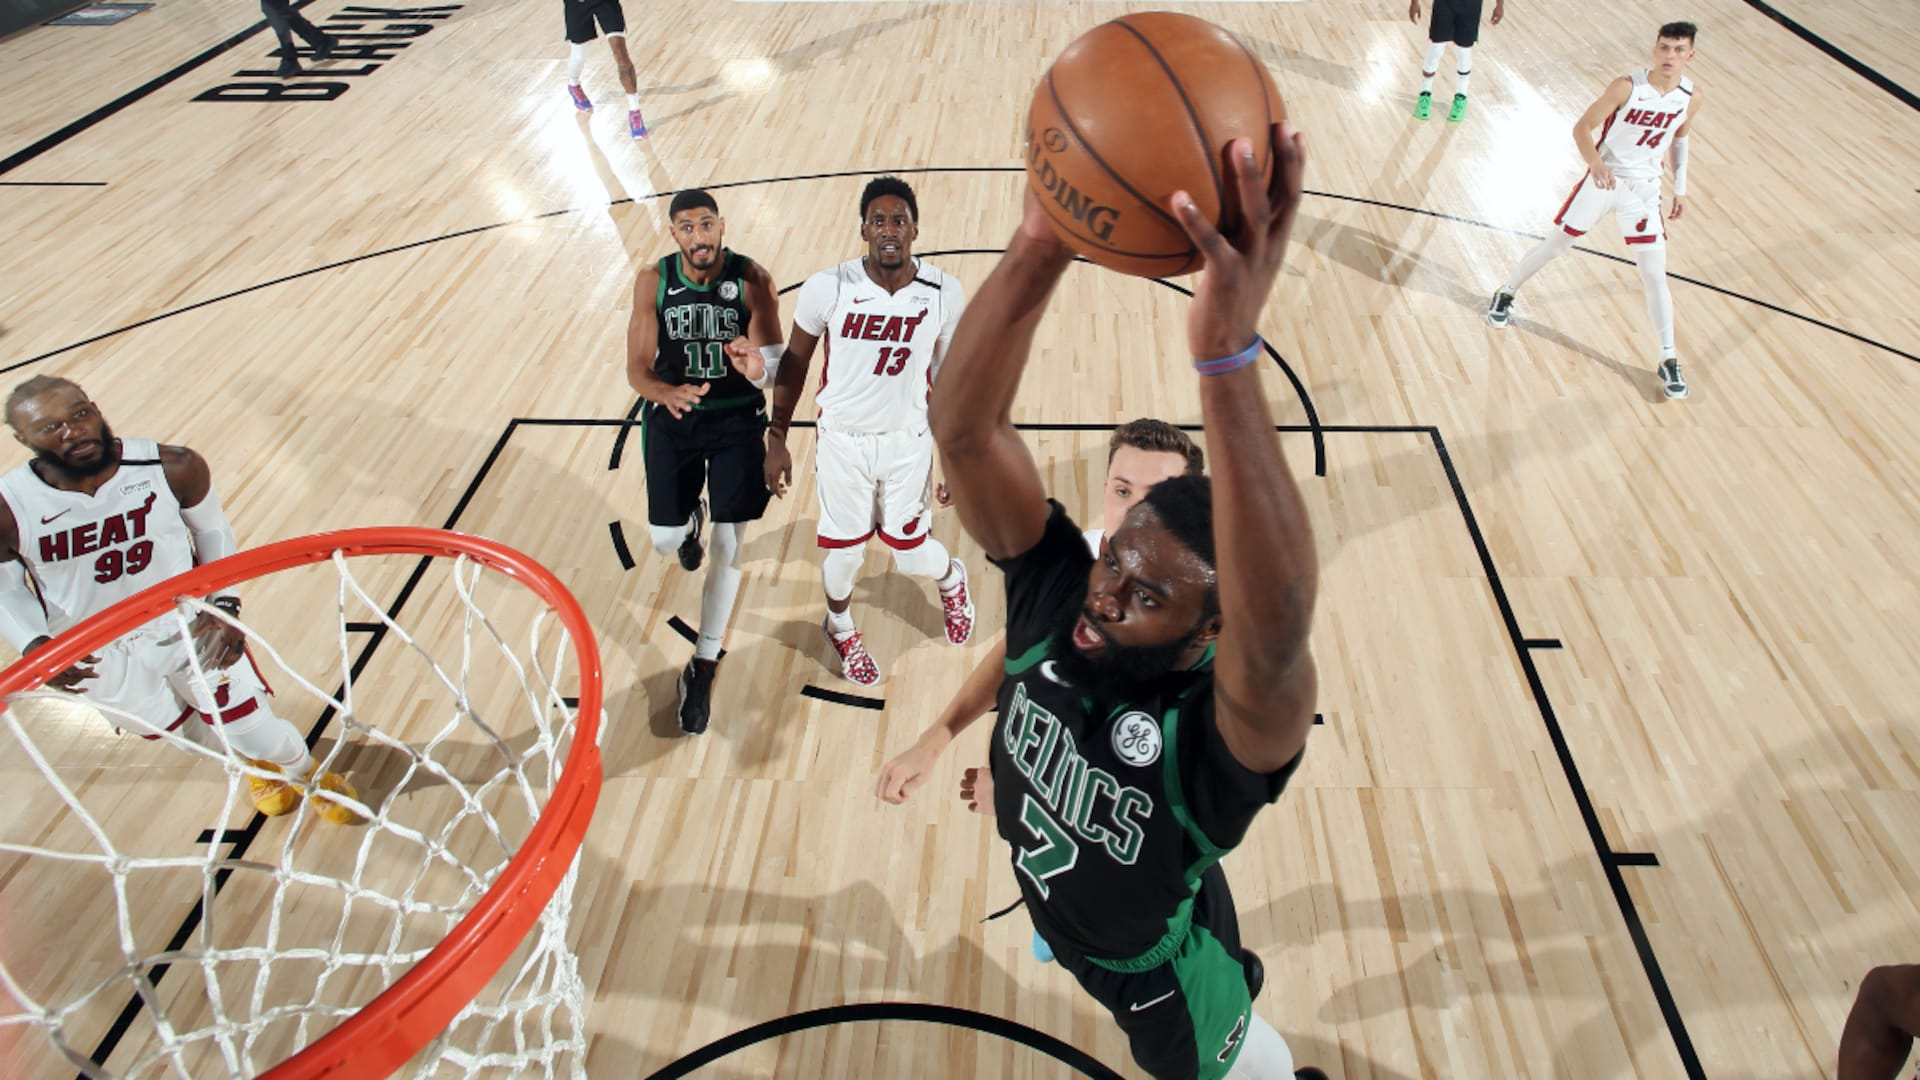 Walker's halftime speech settles Celtics, who respond with series-saving run